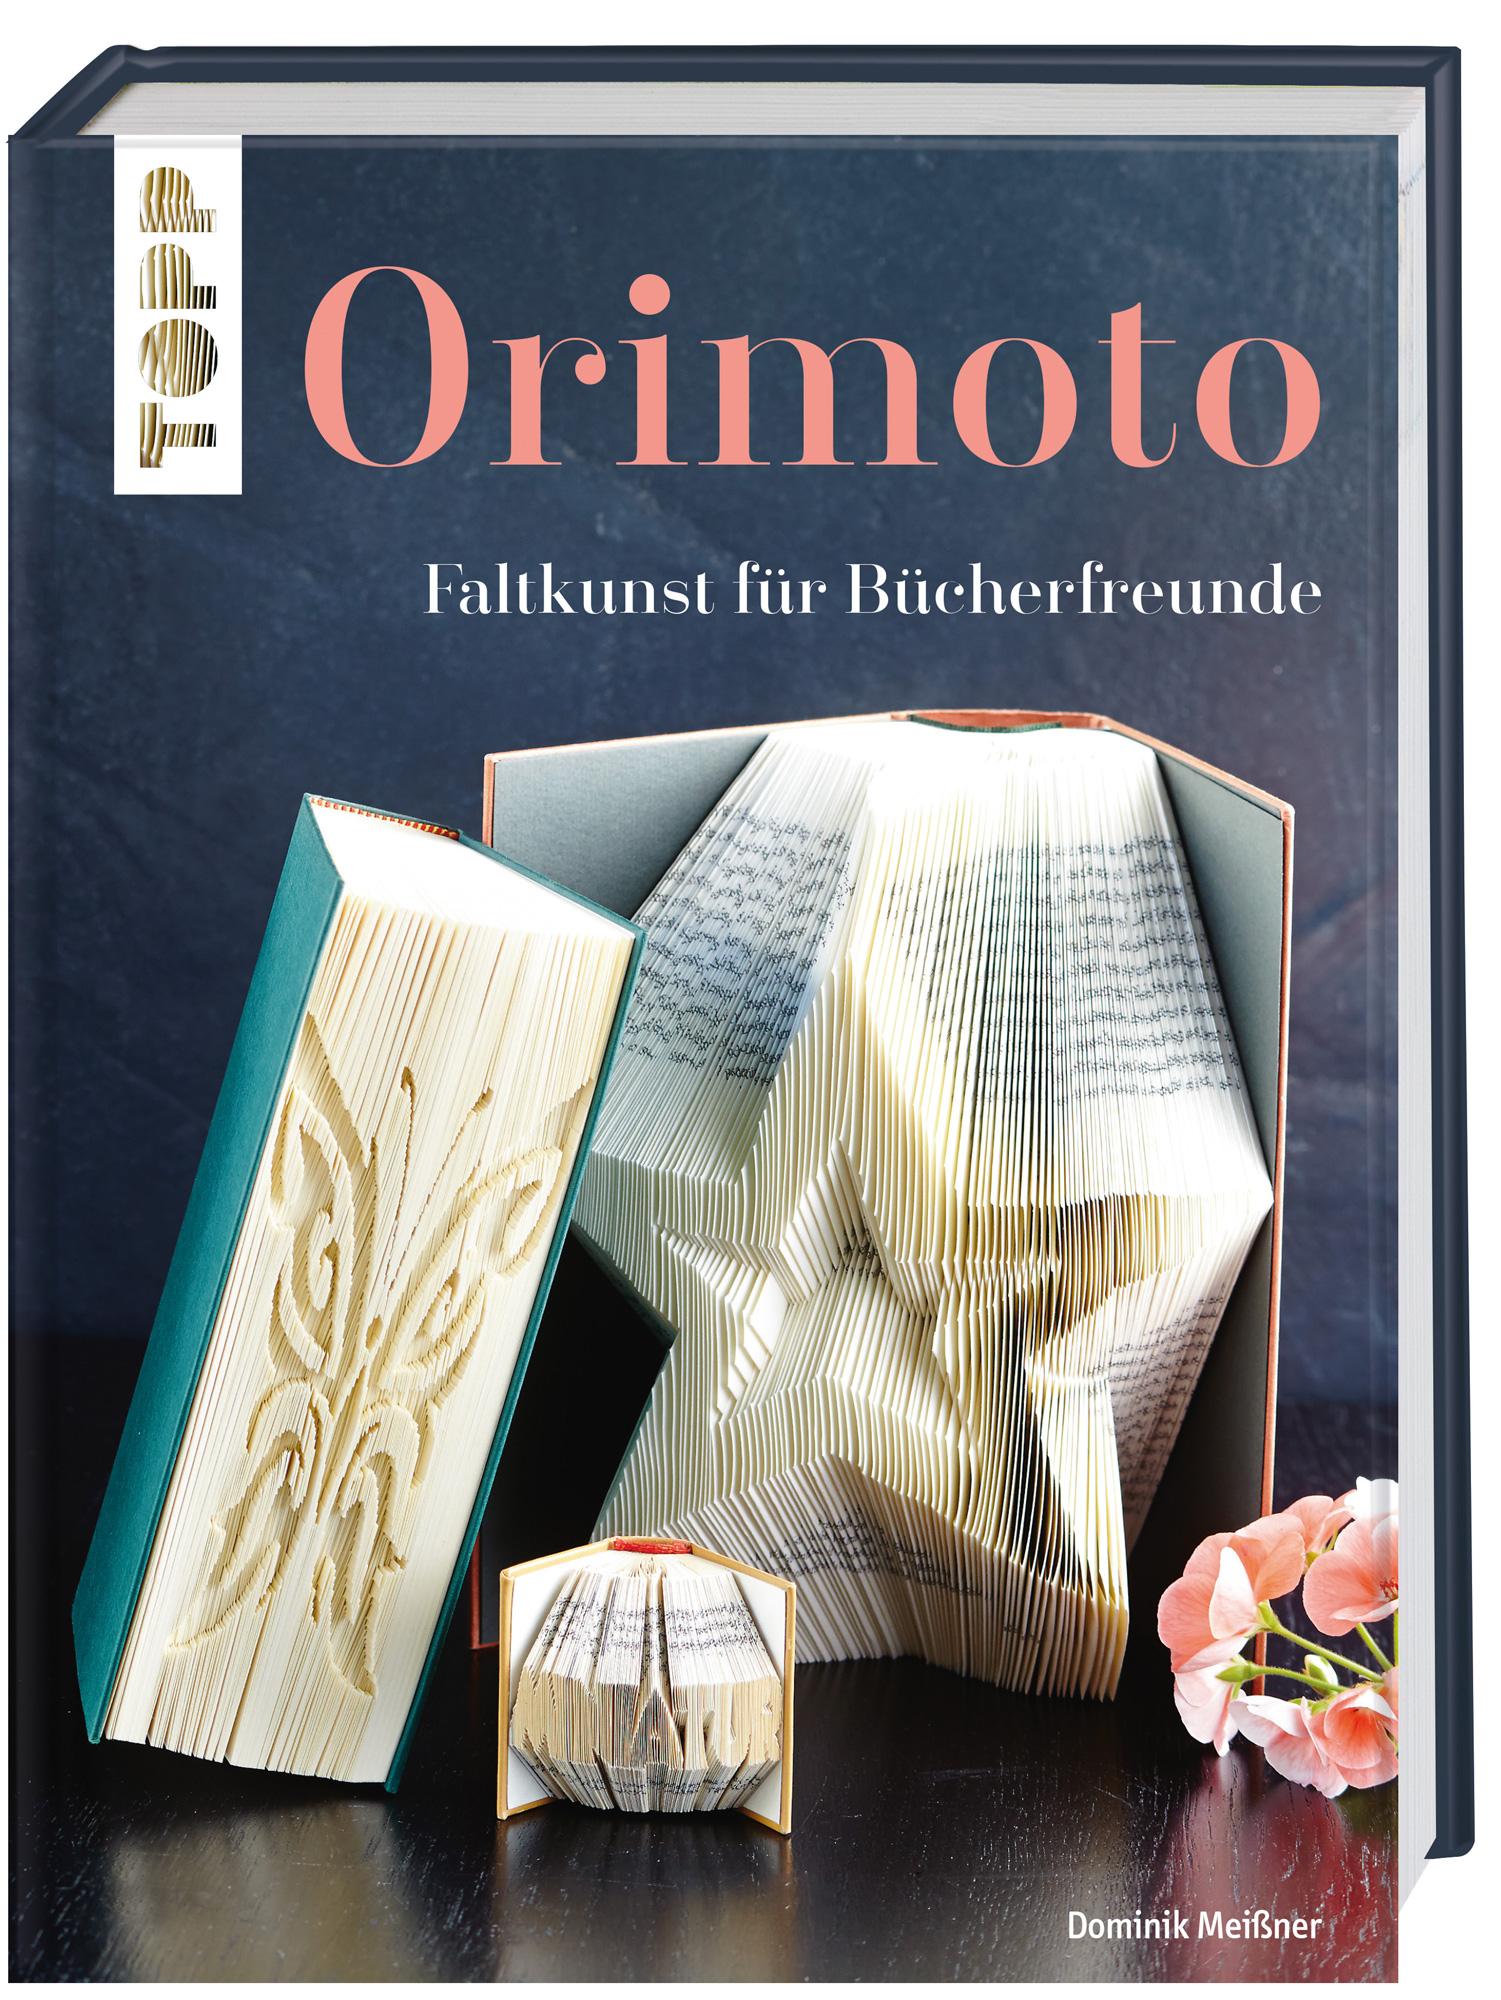 Orimoto | LMS Lehrmittel-Service H.Späth GmbH